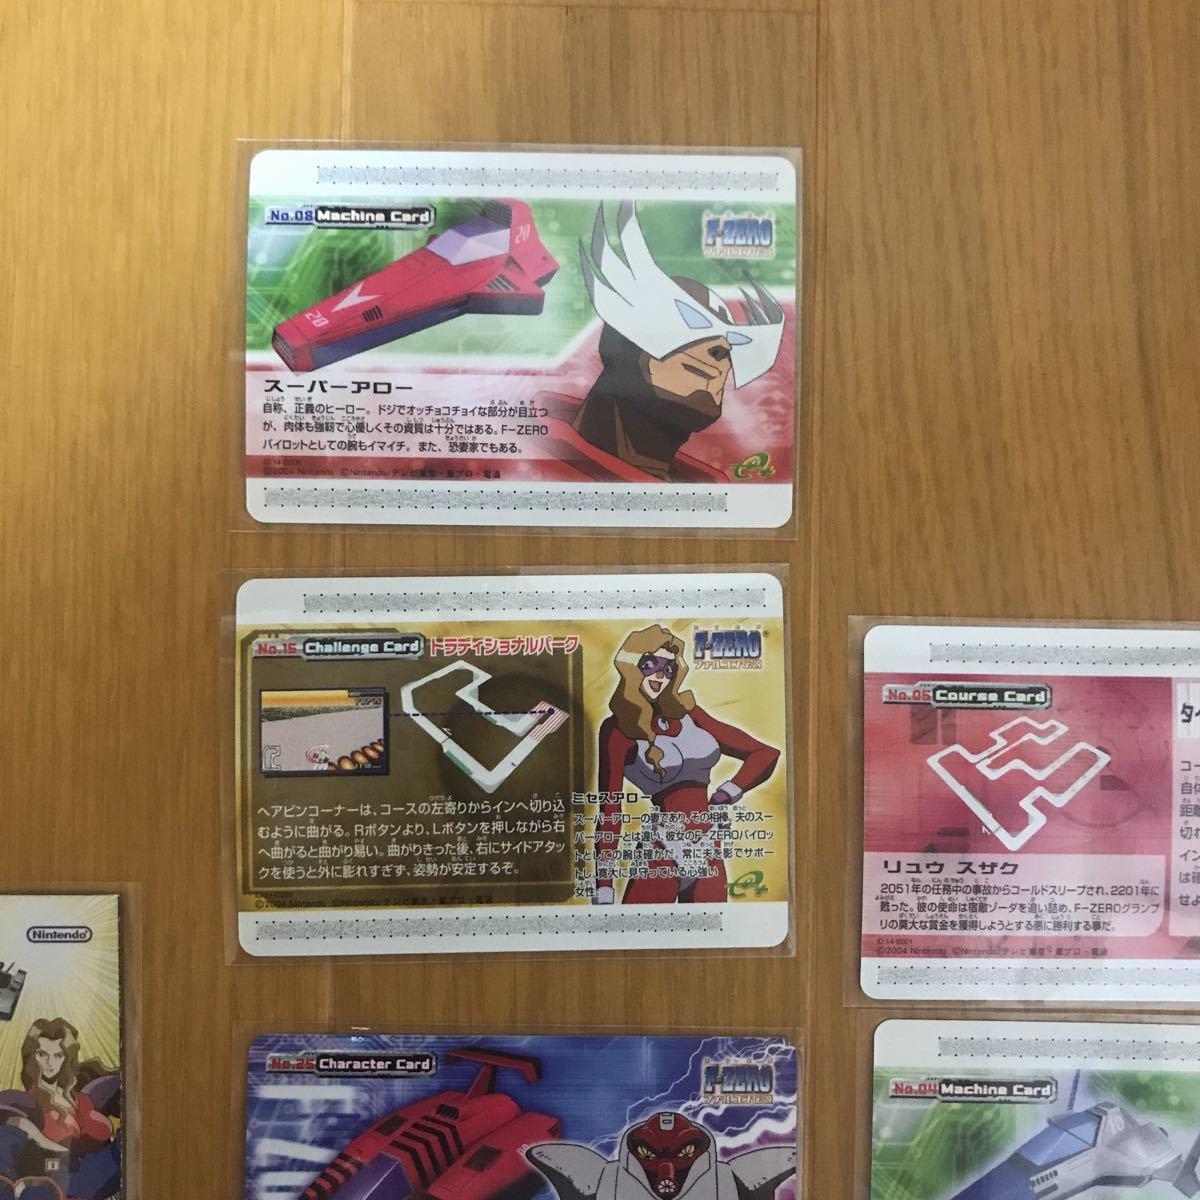 GBA  F-ZERO ファルコン伝説 &【希少】7枚 カードダス版 2枚有り☆ファルコン伝説カードe+ トレカ カード 任天堂 キャプテンファルコン_画像7